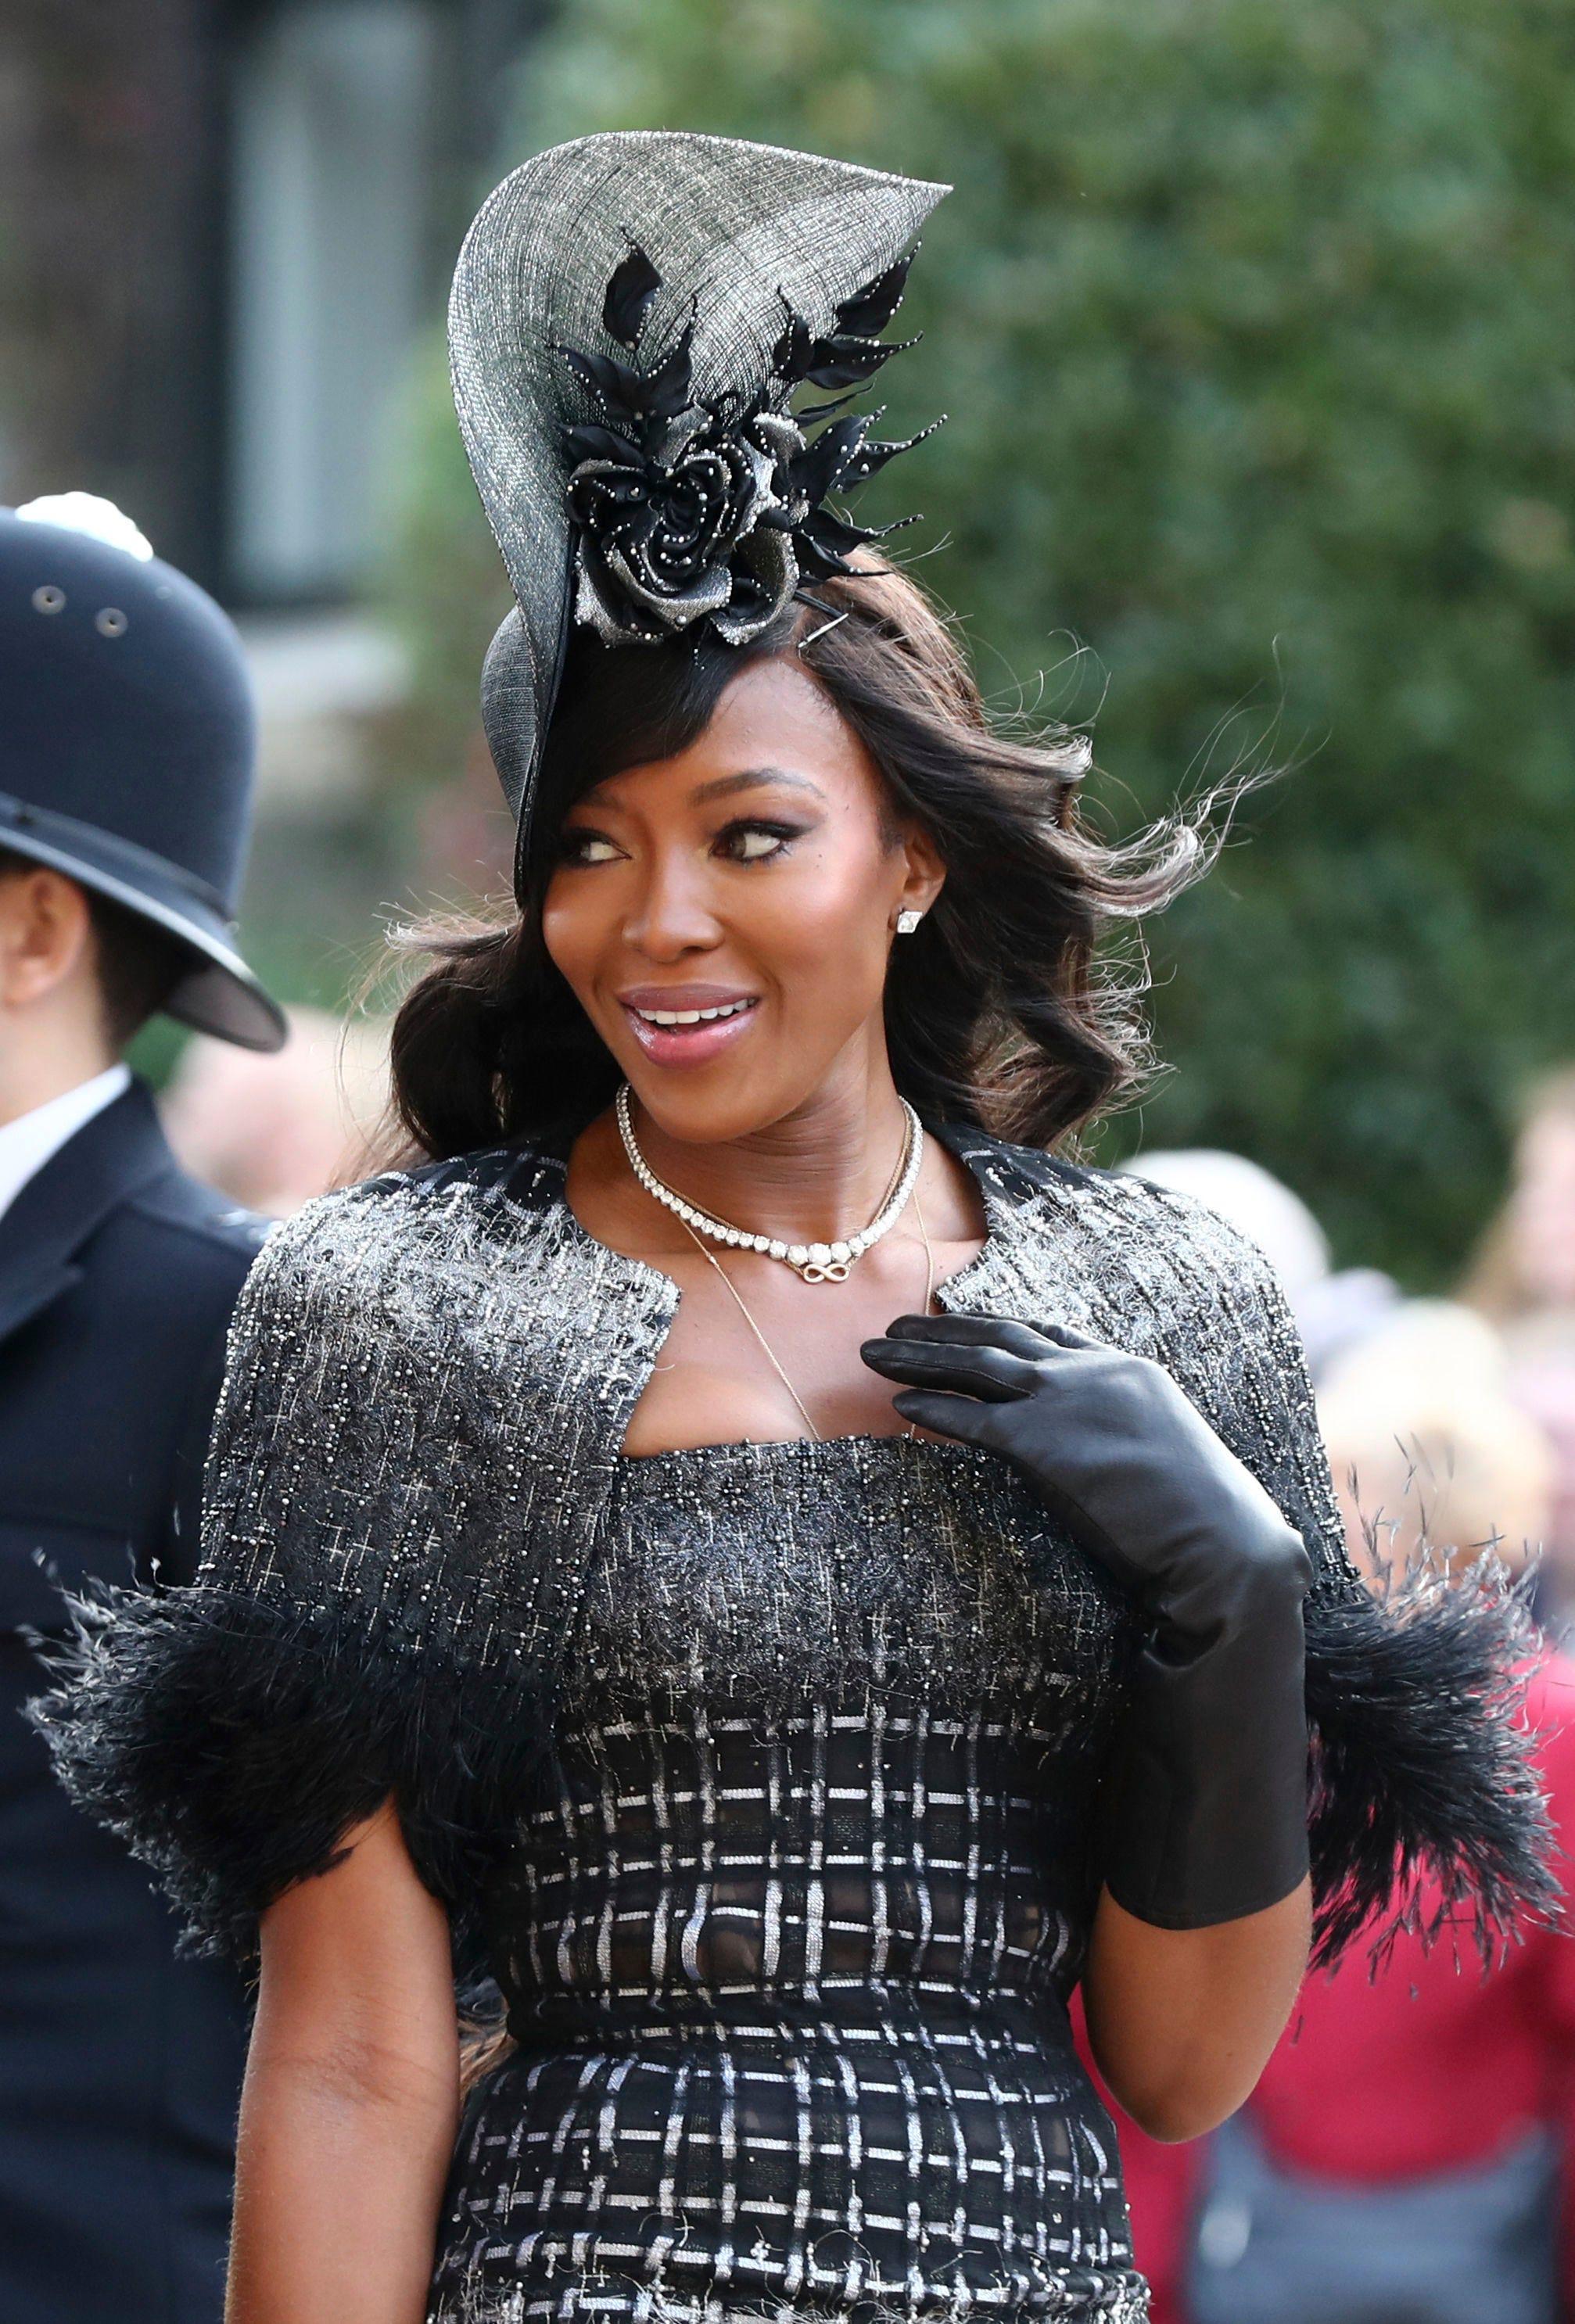 Celebrities flock to Princess Eugenie's royal wedding